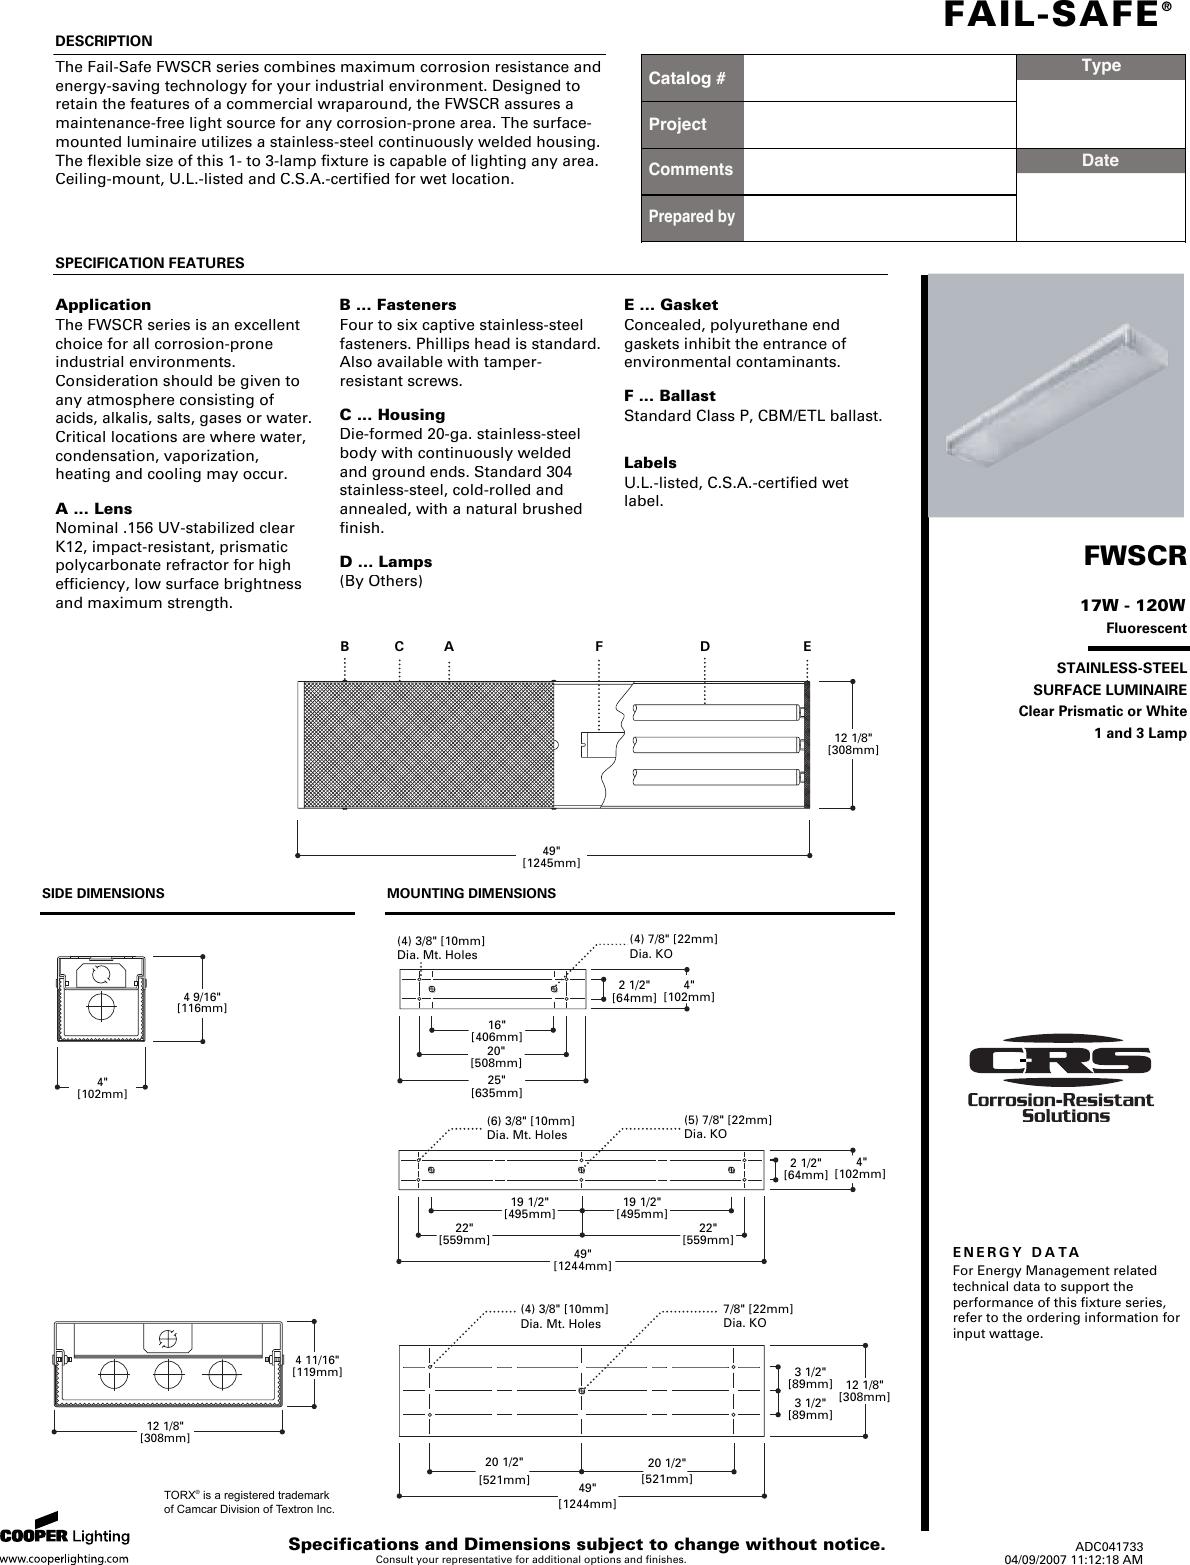 Cooper Lighting Fail Safe Fwscr Users Manual Annotatelumiere